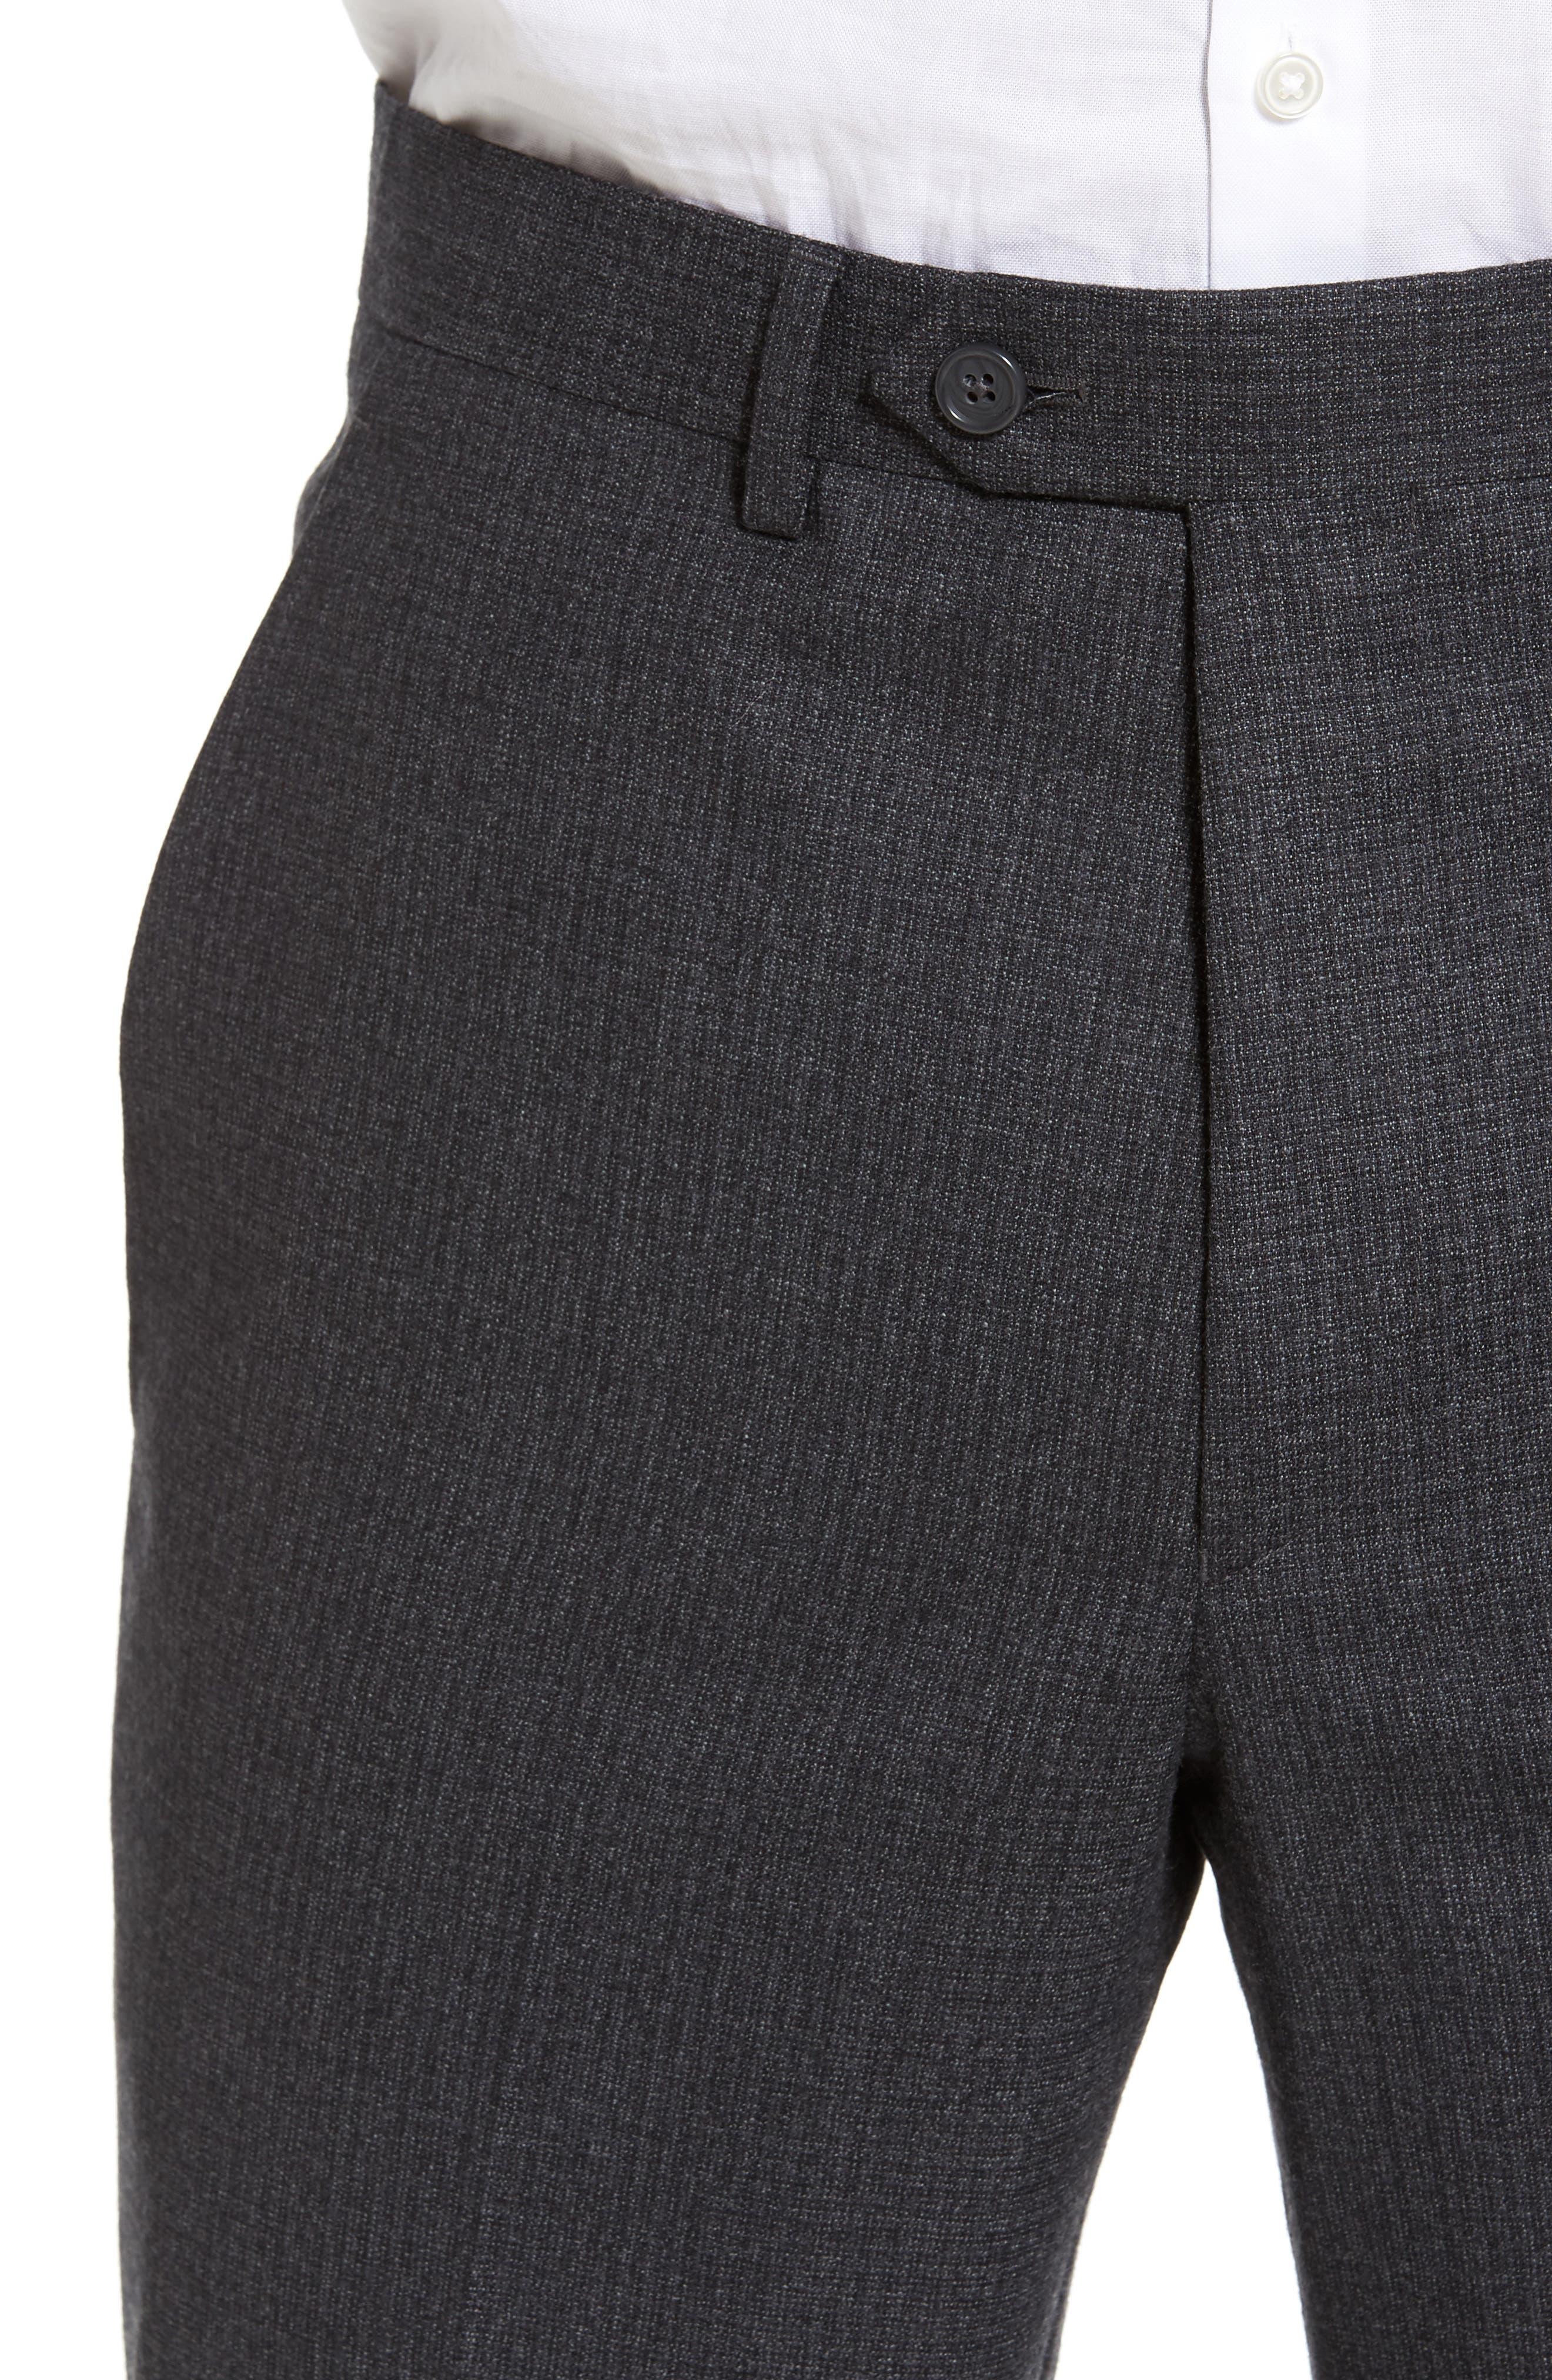 Romero Regular Fit Flat Front Trousers,                             Alternate thumbnail 5, color,                             010